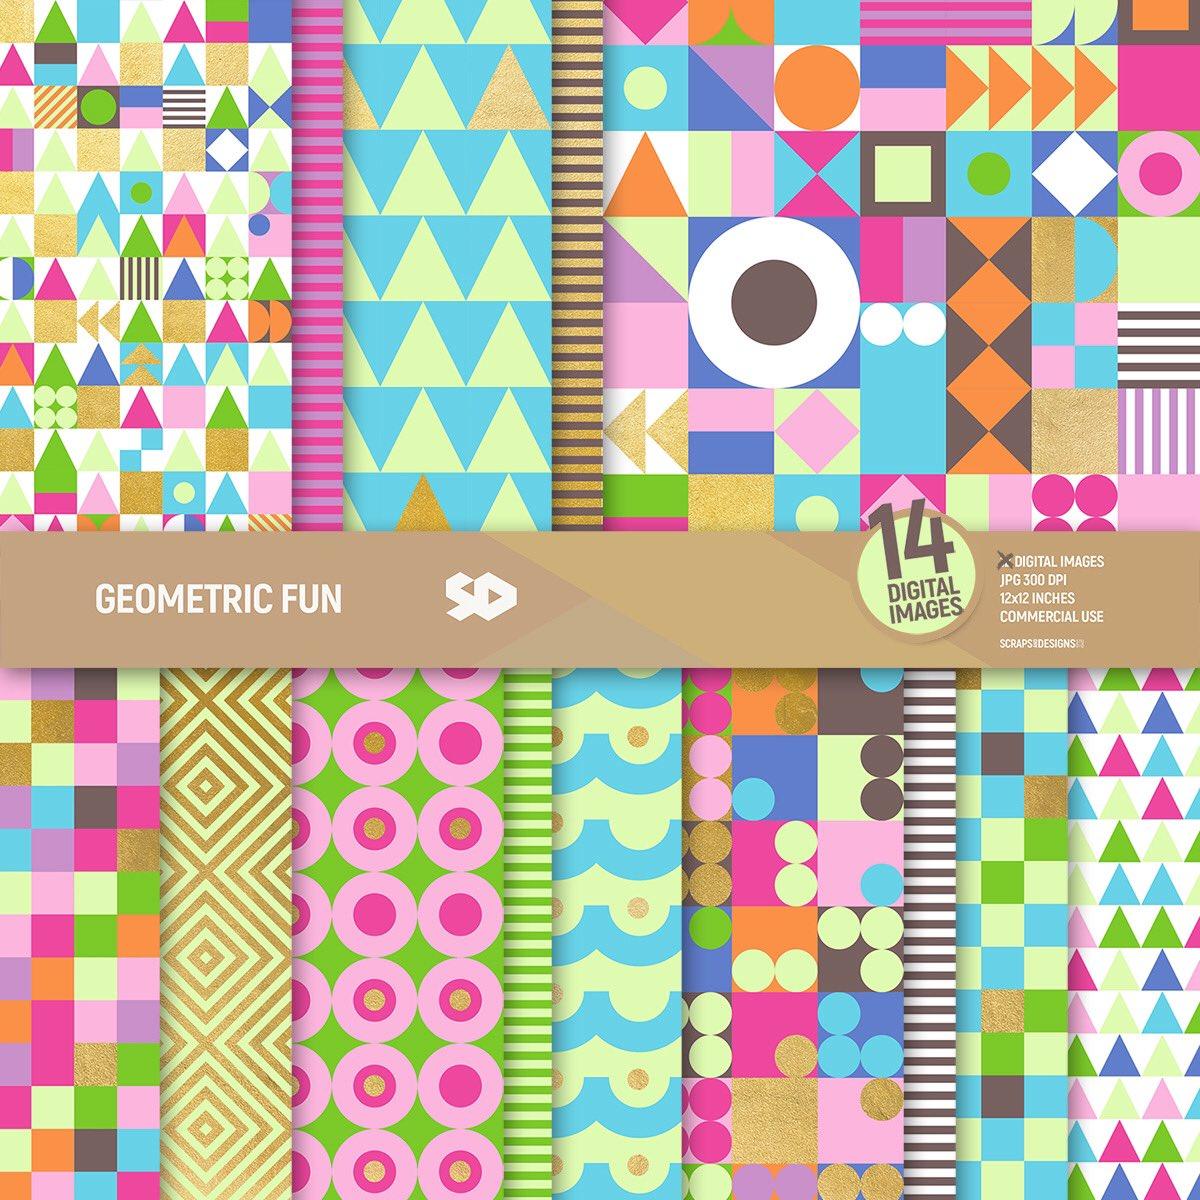 Geometric fun digital paper.  https://t.co/nvCindPnxQ  #scrapbook #scrapbooking #crafts #digitalpaper #etsy #illustration #supplies #partygifting #diy #junkjornal #cardmaking #art #graphicdesign #paperart #papercrafting #artsupplies #digital #paper #paperart #printable #planner https://t.co/OuCqI7f5im